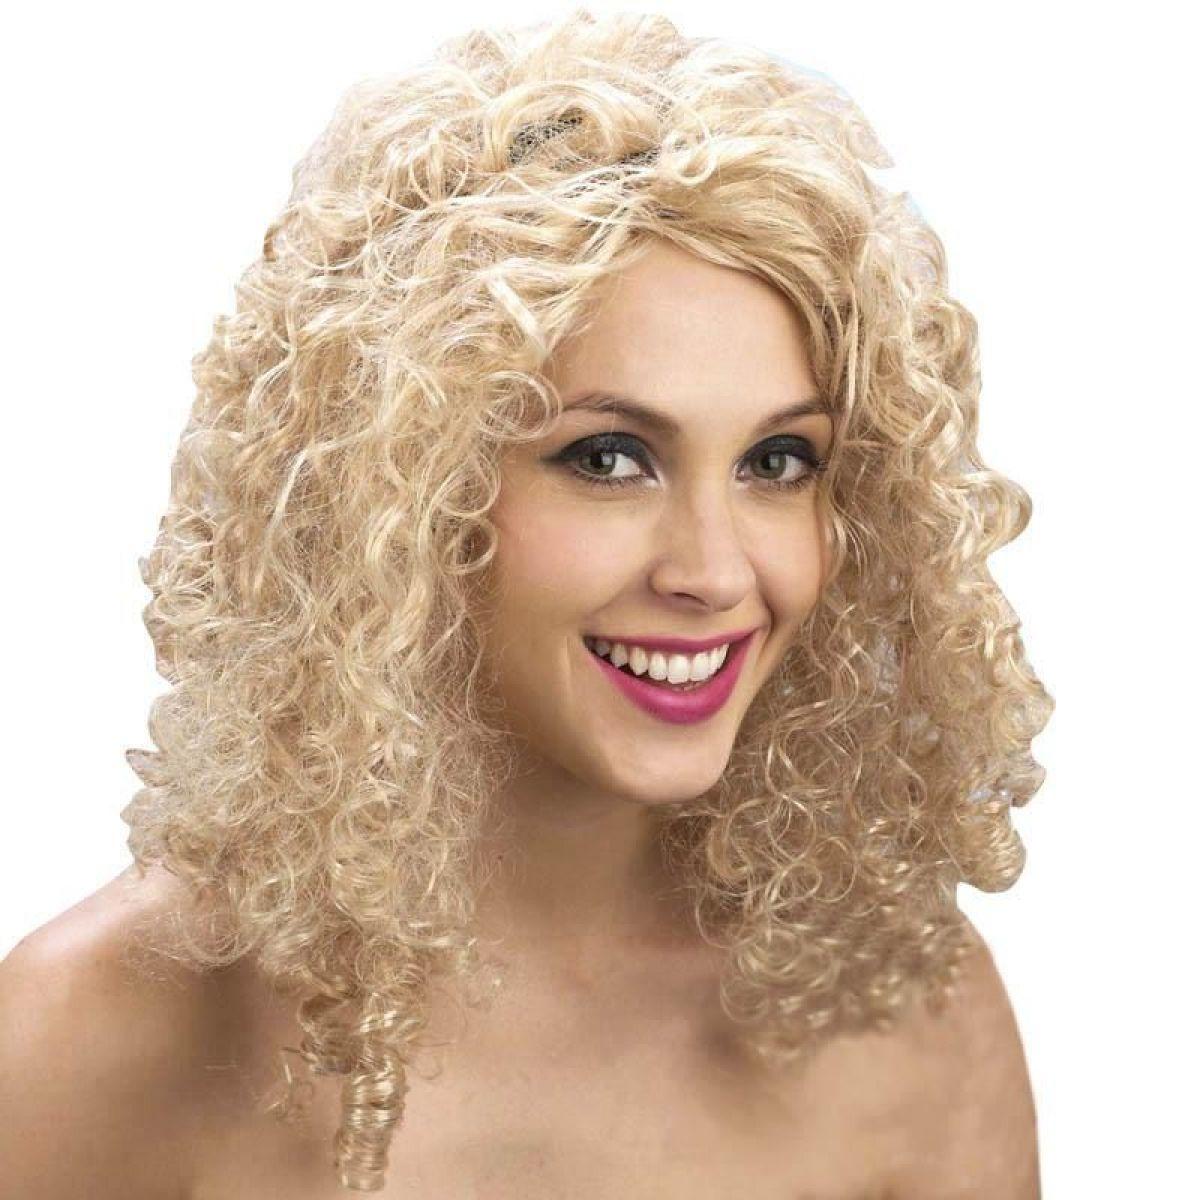 HM Studio Paruka s blond vlasy